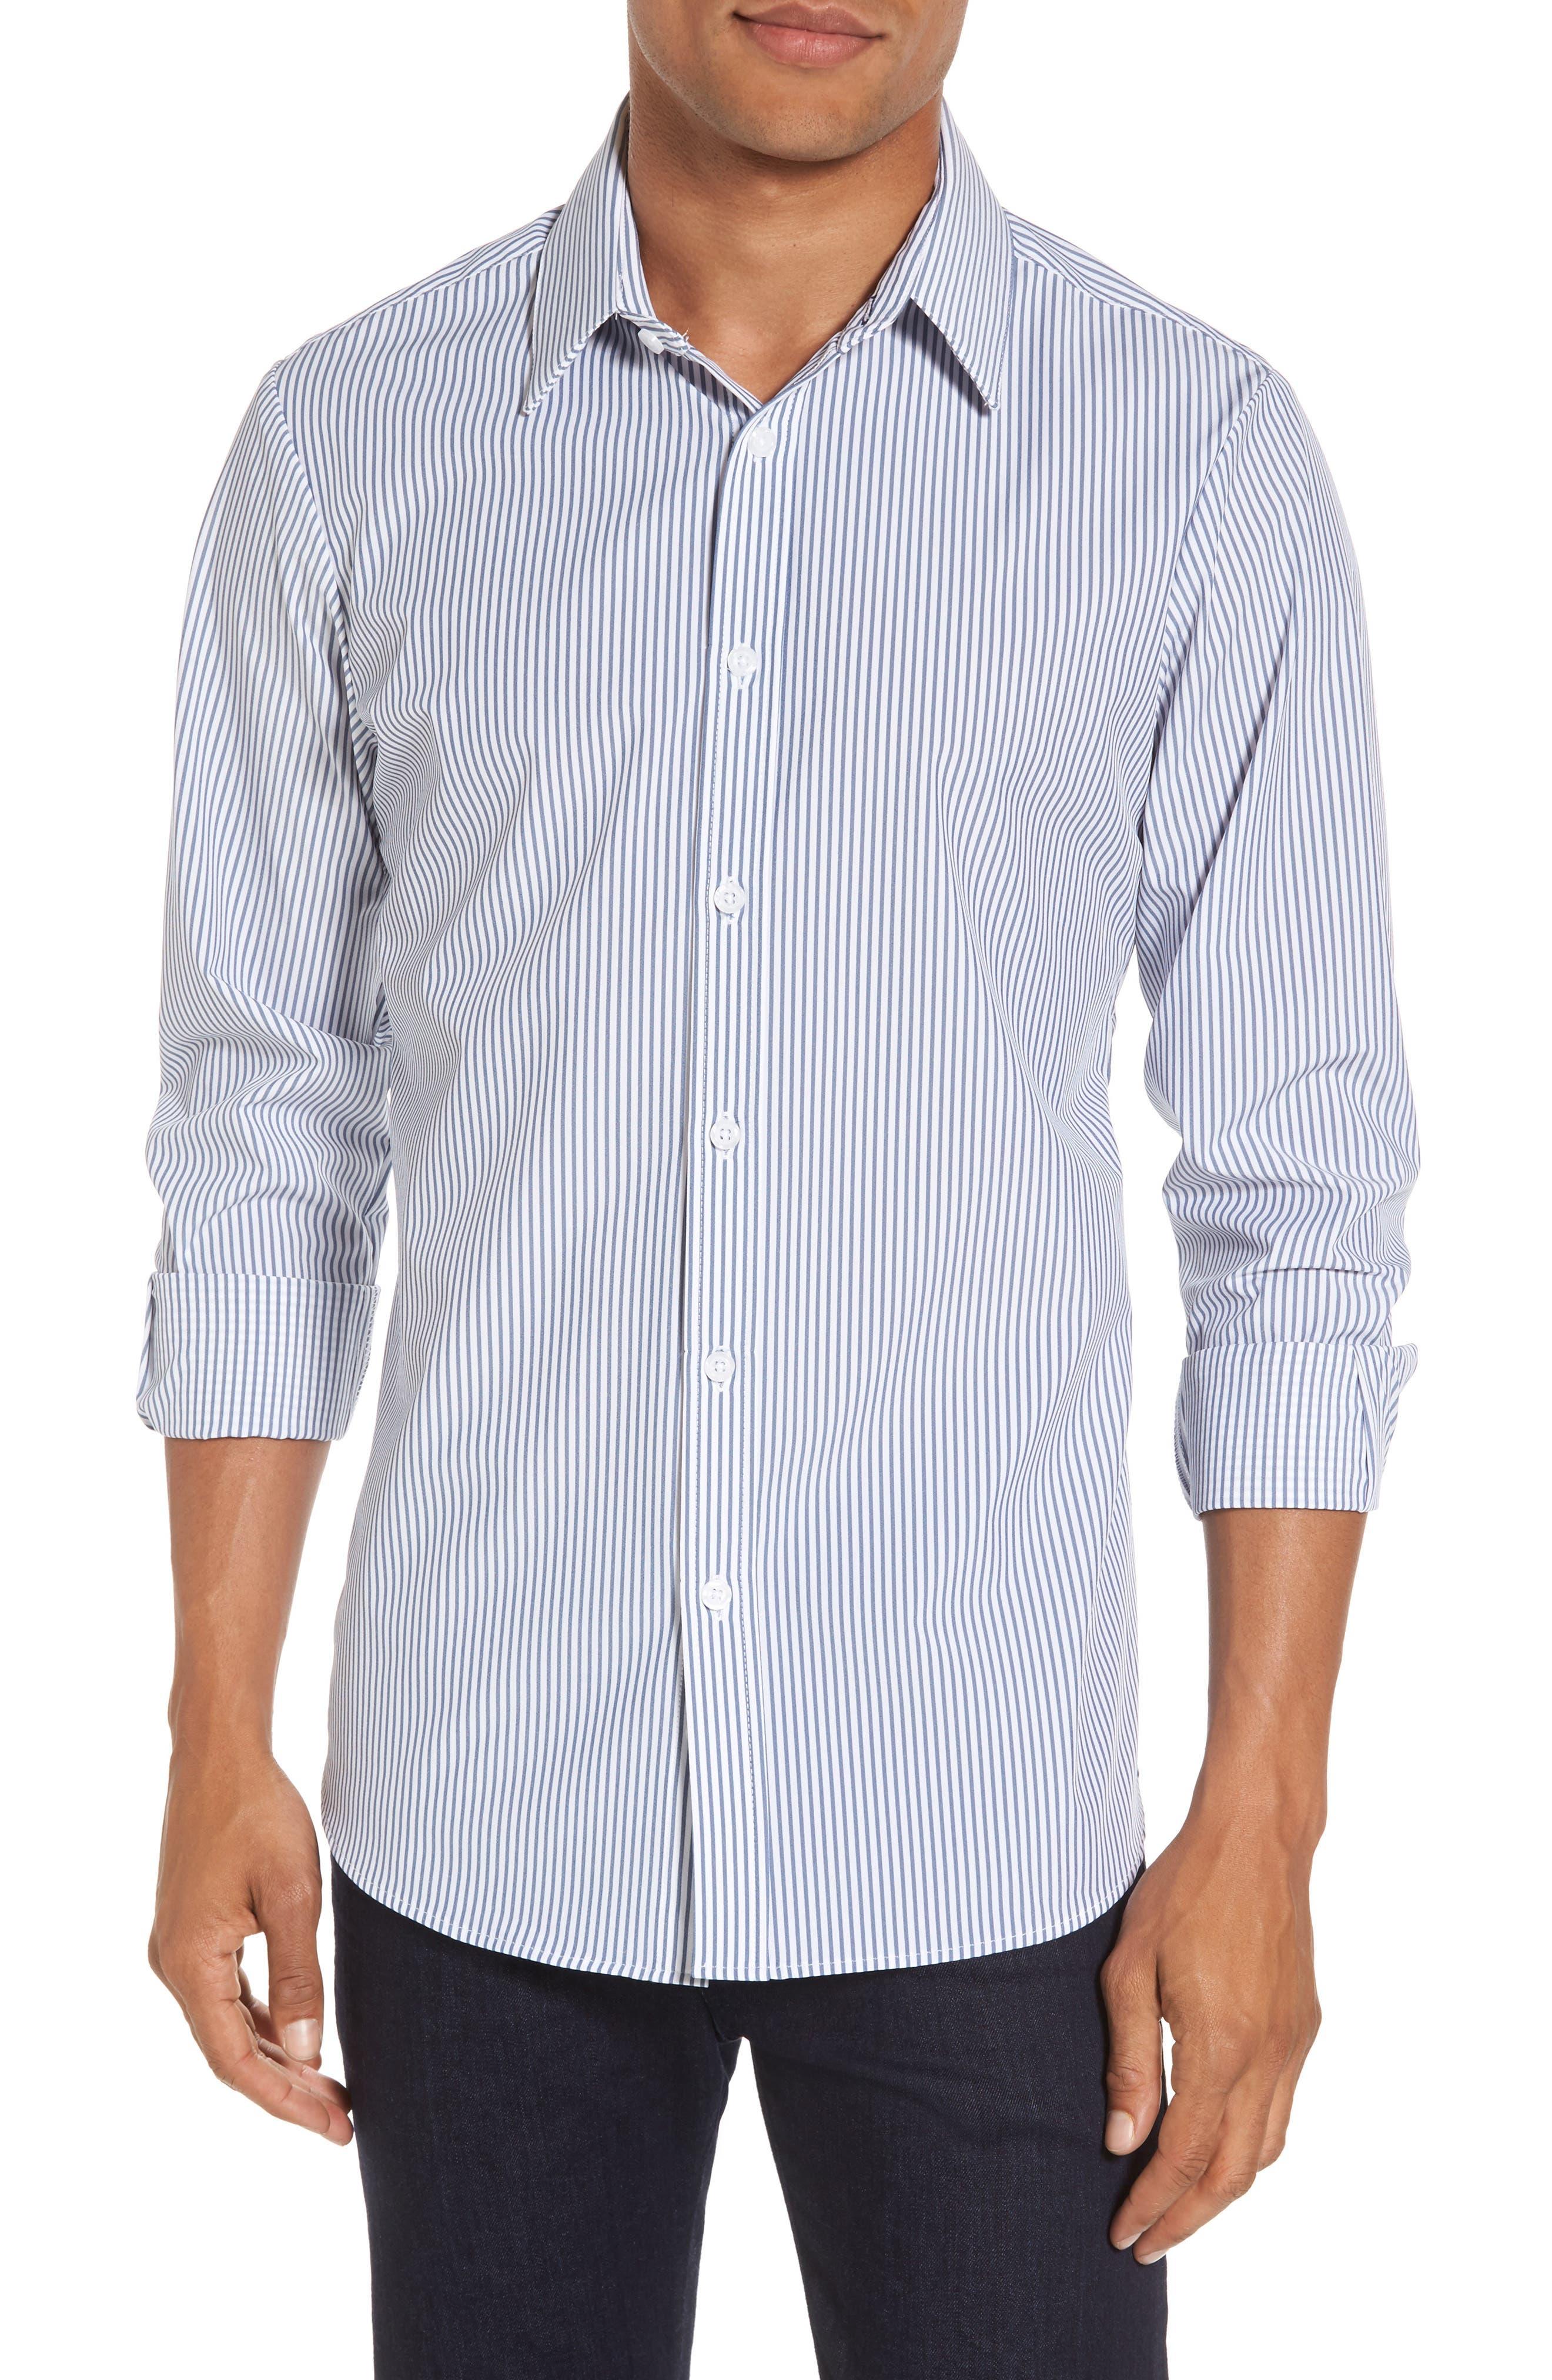 Main Image - Mizzen+Main Wilkes Stripe Performance Sport Shirt (Regular & Tall)